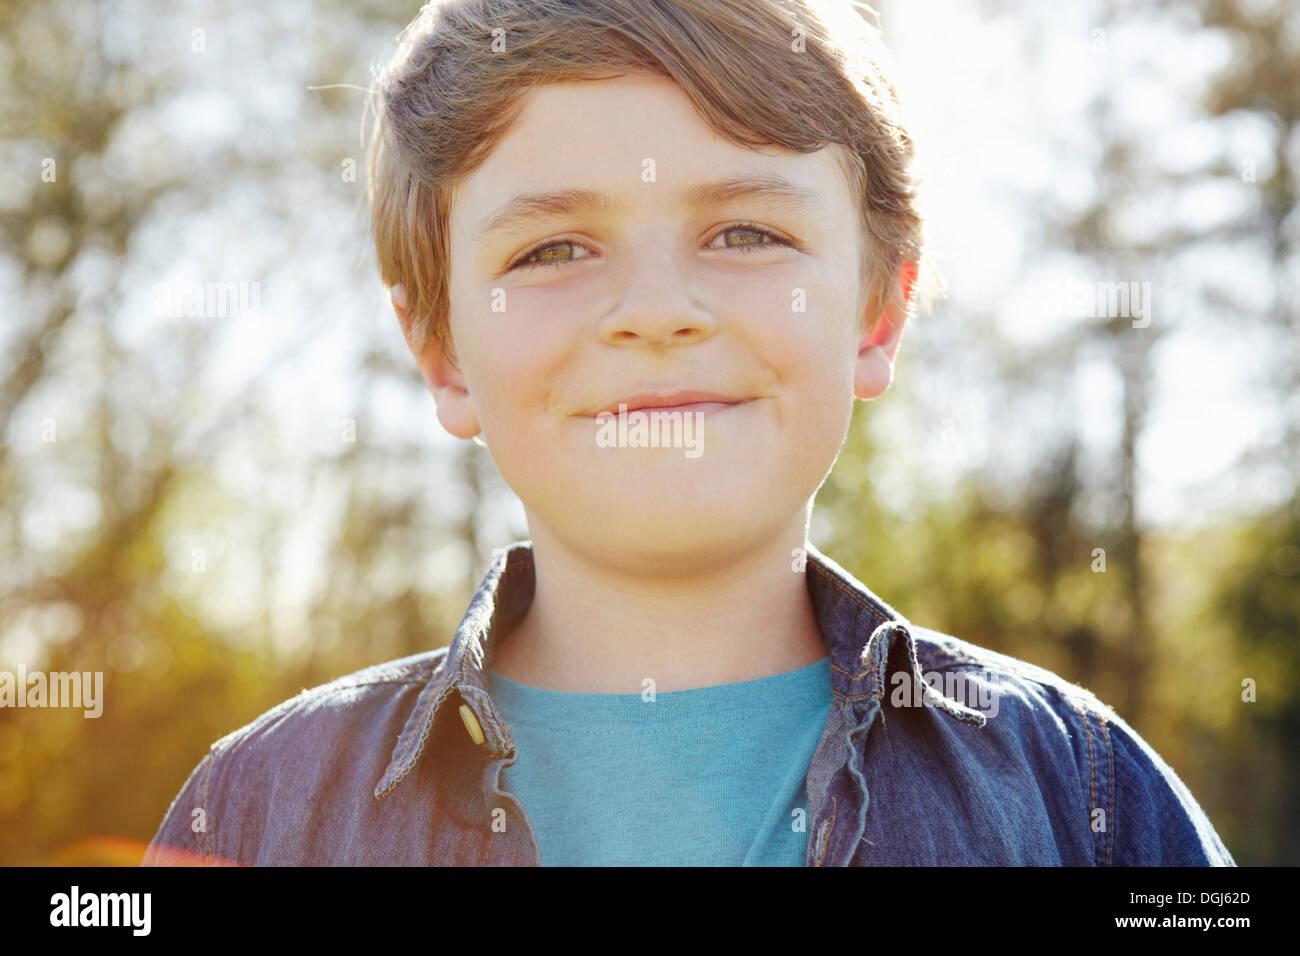 Chico con impertinente sonrisa Imagen De Stock